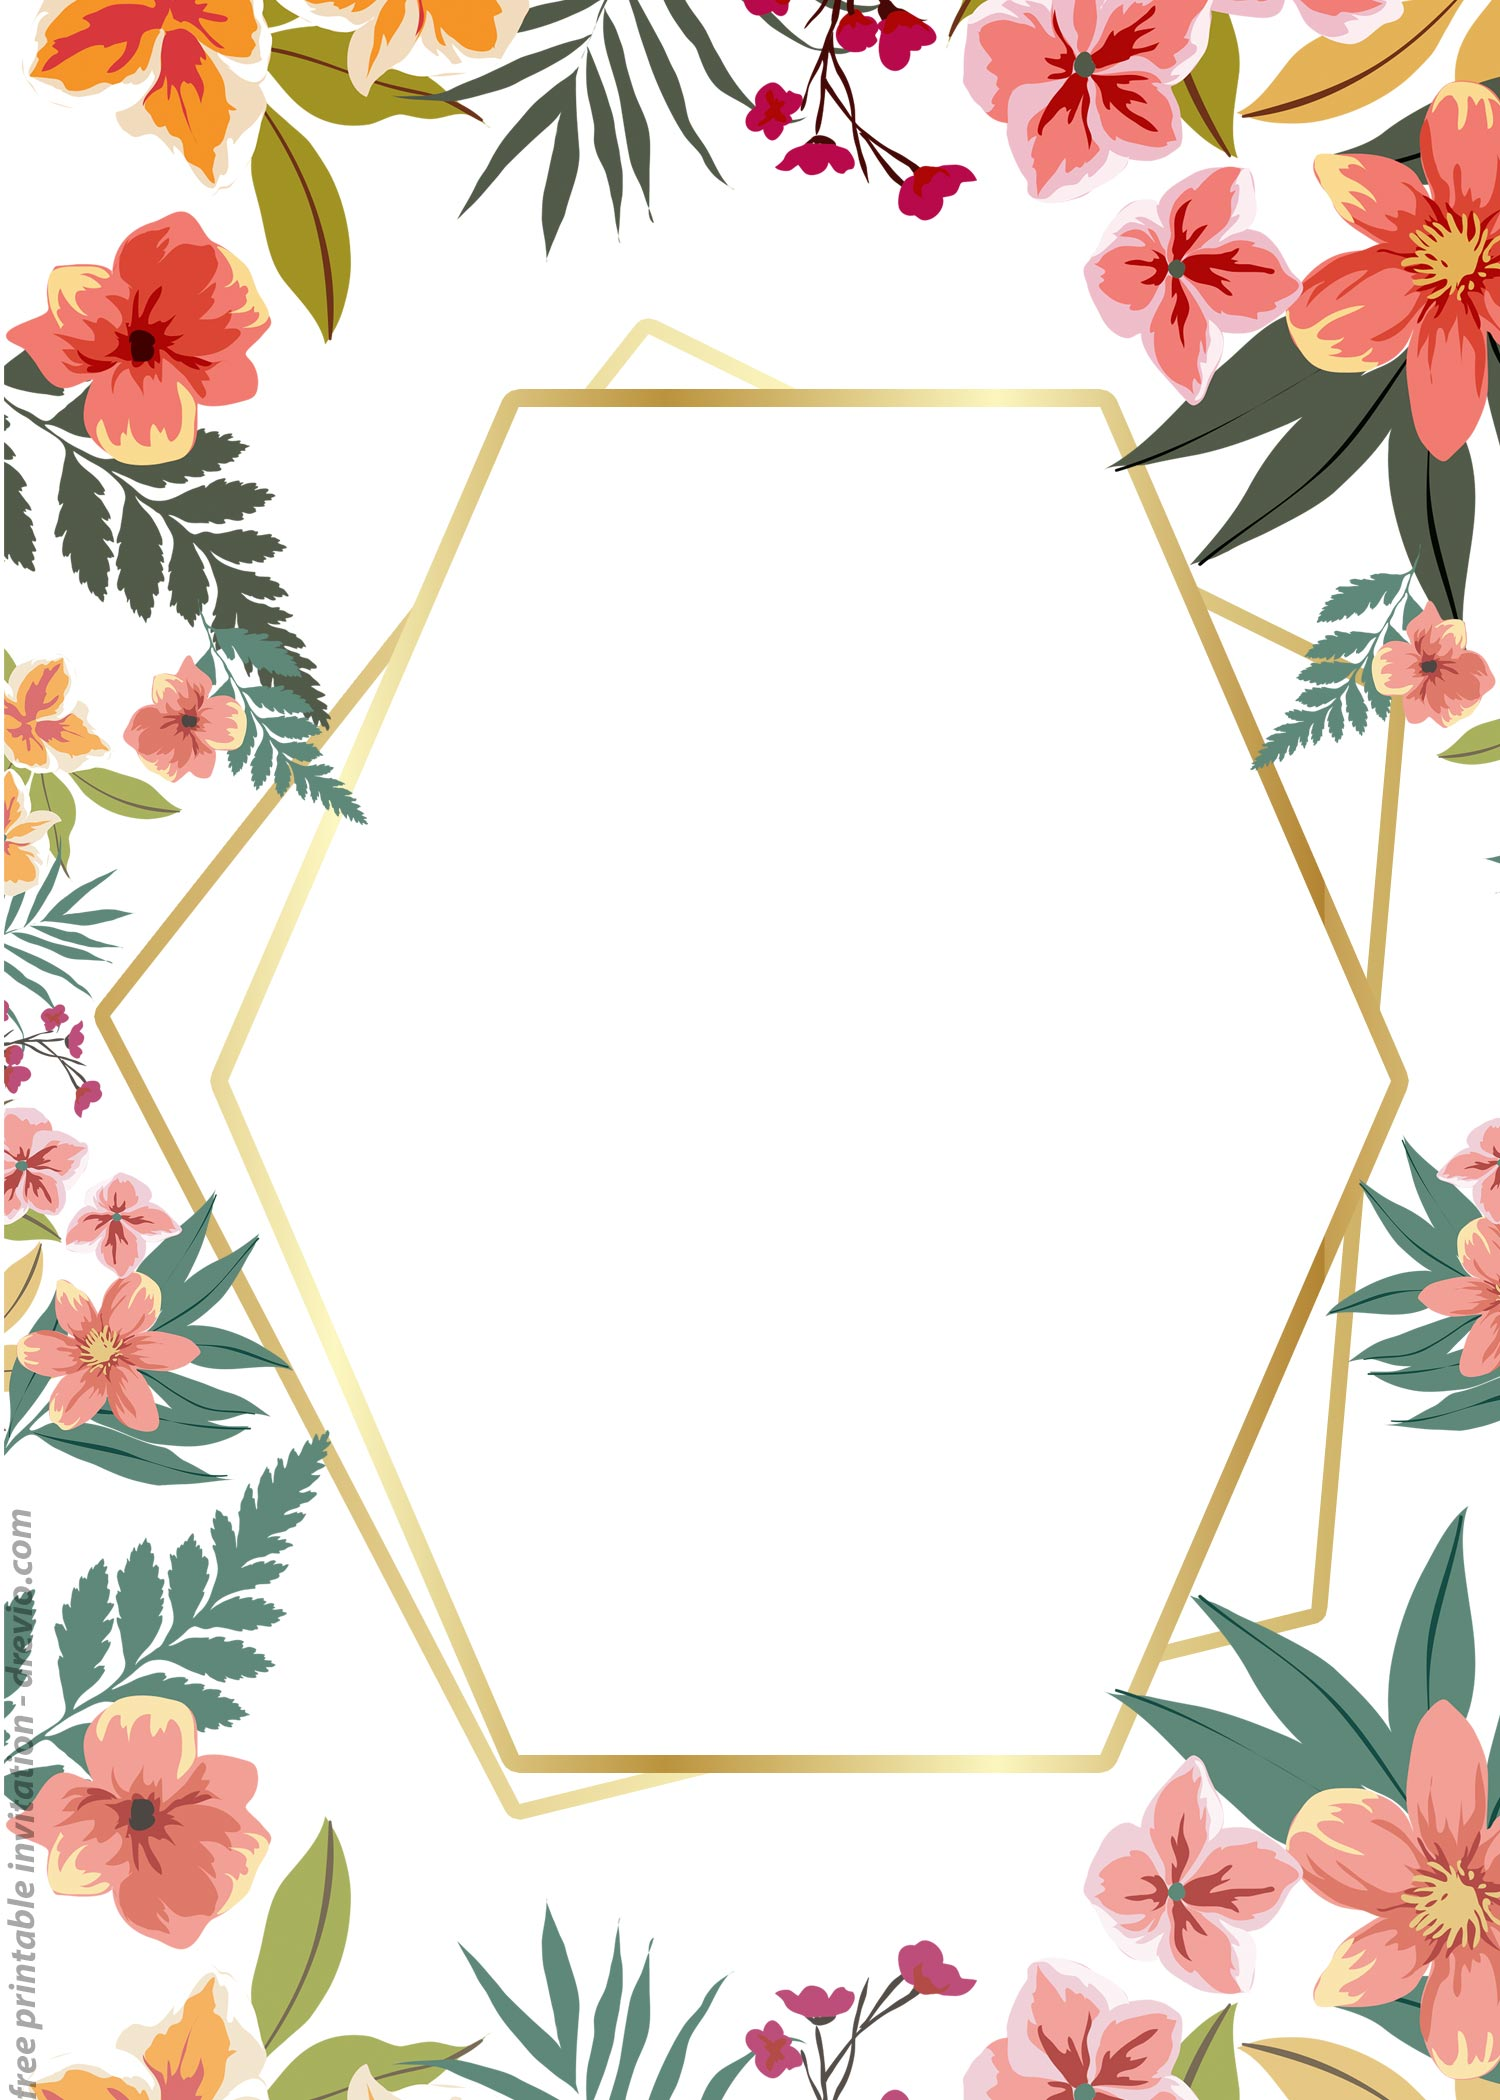 24 Free Printable Floral Watercolor Invitation Templates